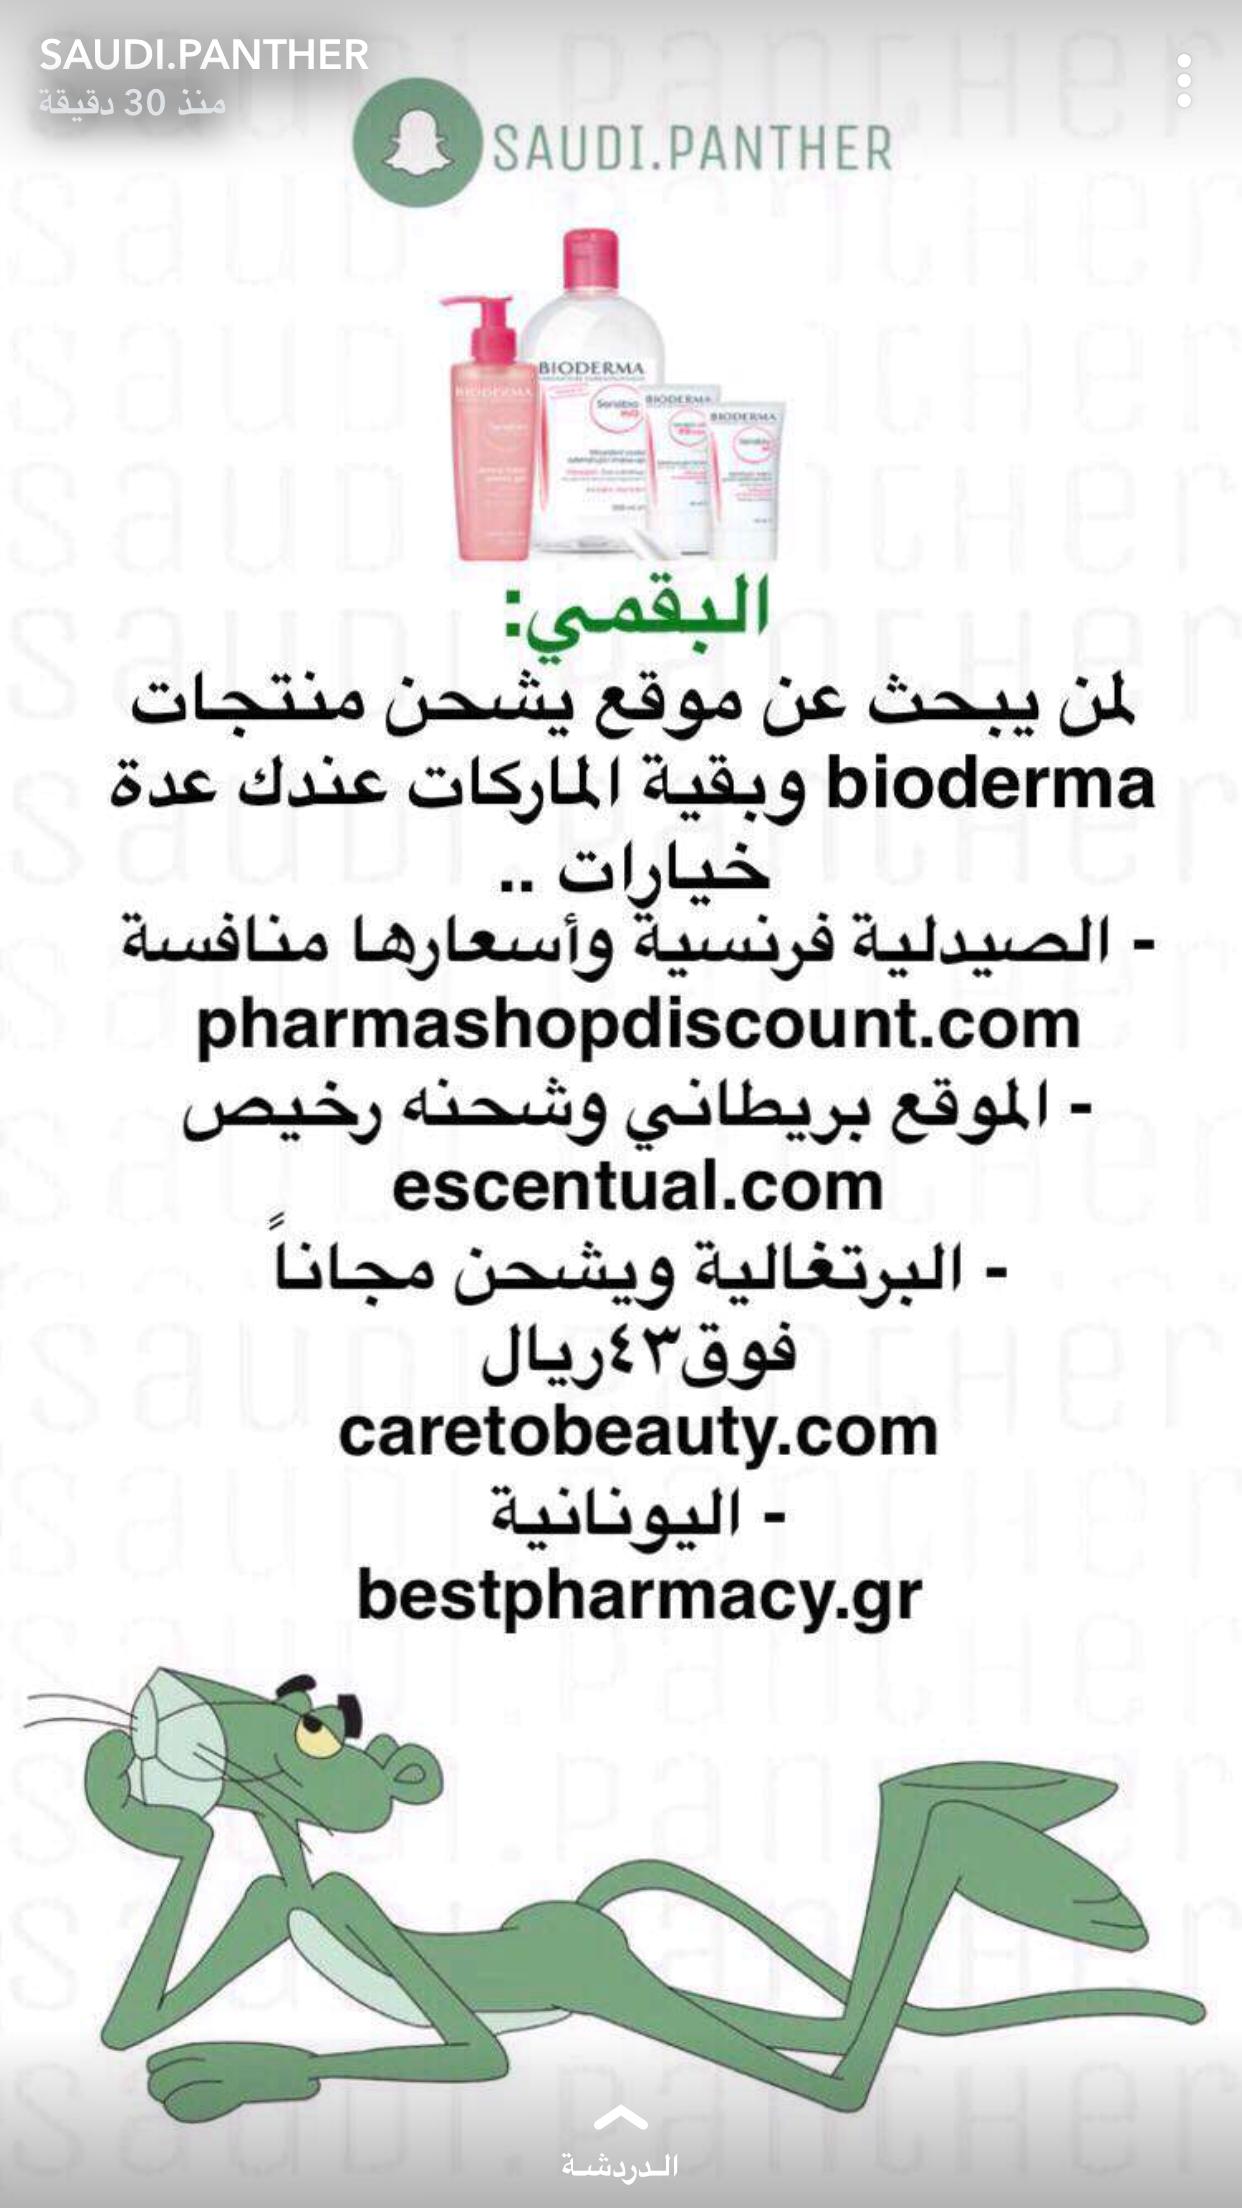 Pin By Sara Alhazmi On البانثر السعودي Best Online Shopping Websites Shopping Websites Online Shopping Clothes